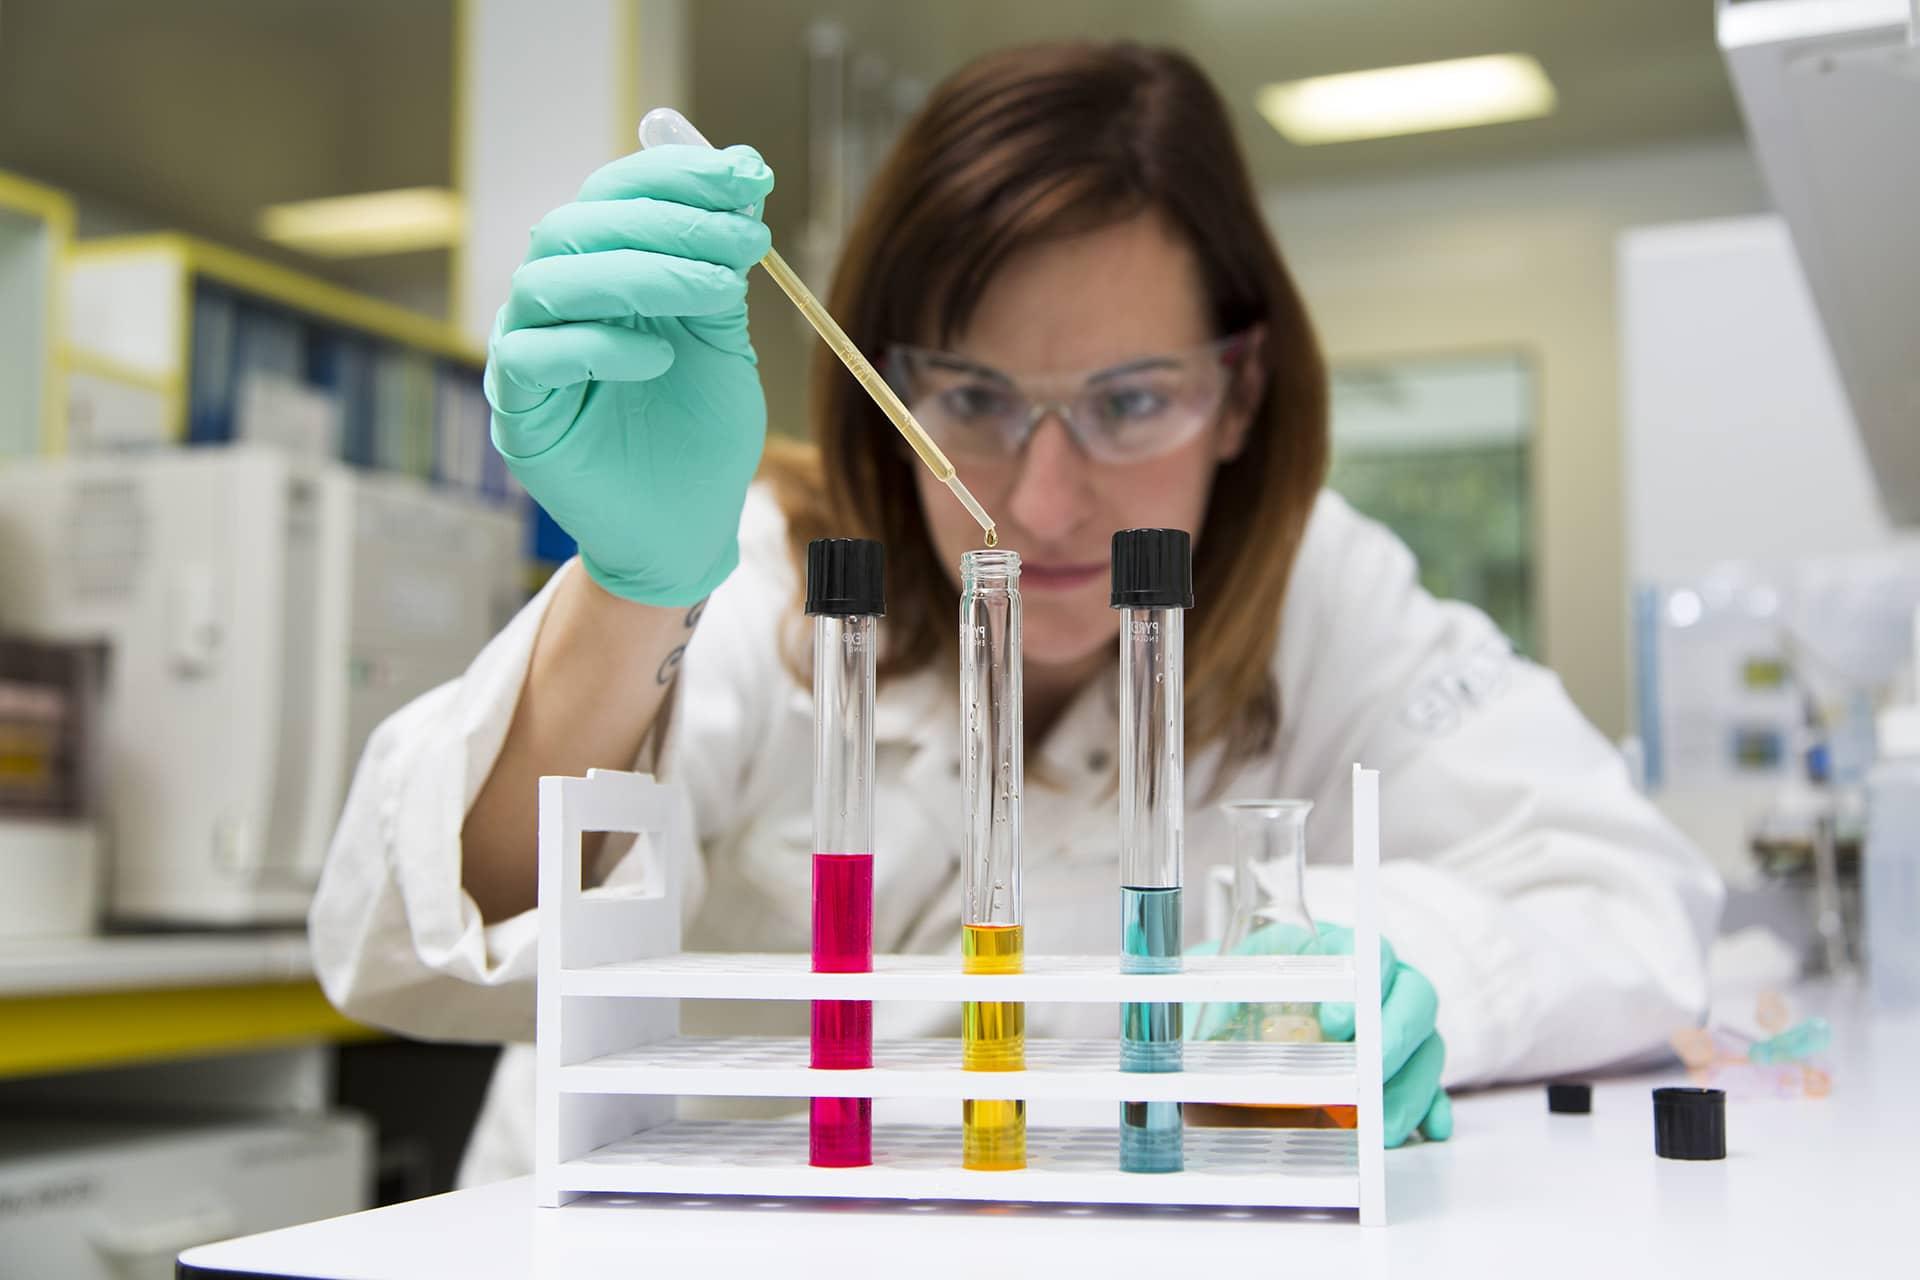 Laboratoire chimie Novasep